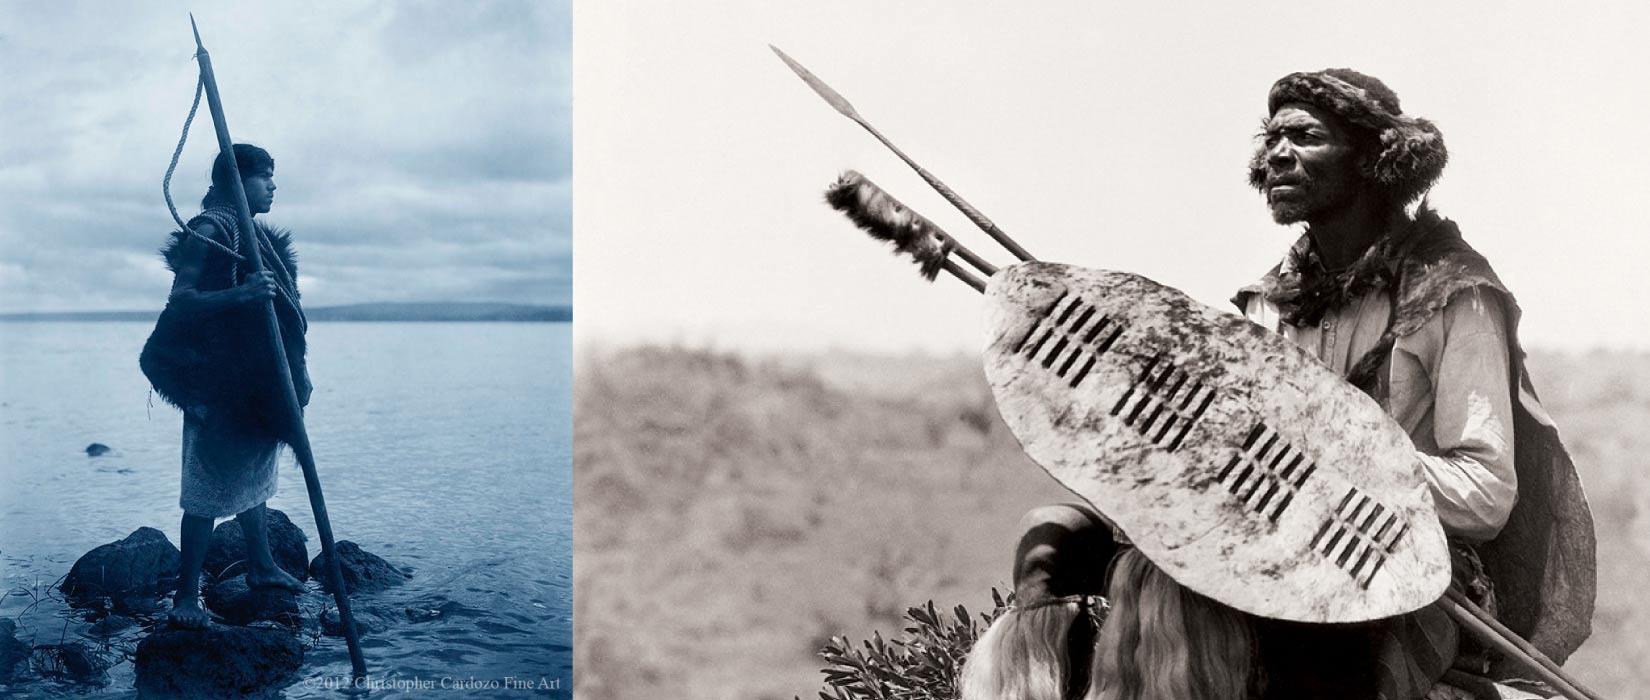 Detail of 'Ben Mdiliza, Shangaan warrior, Thabina, Limpopo.' Duggan-Cronin [left] & 'Motana with harpoon- Hesquiat(Nootka)' by Curtis